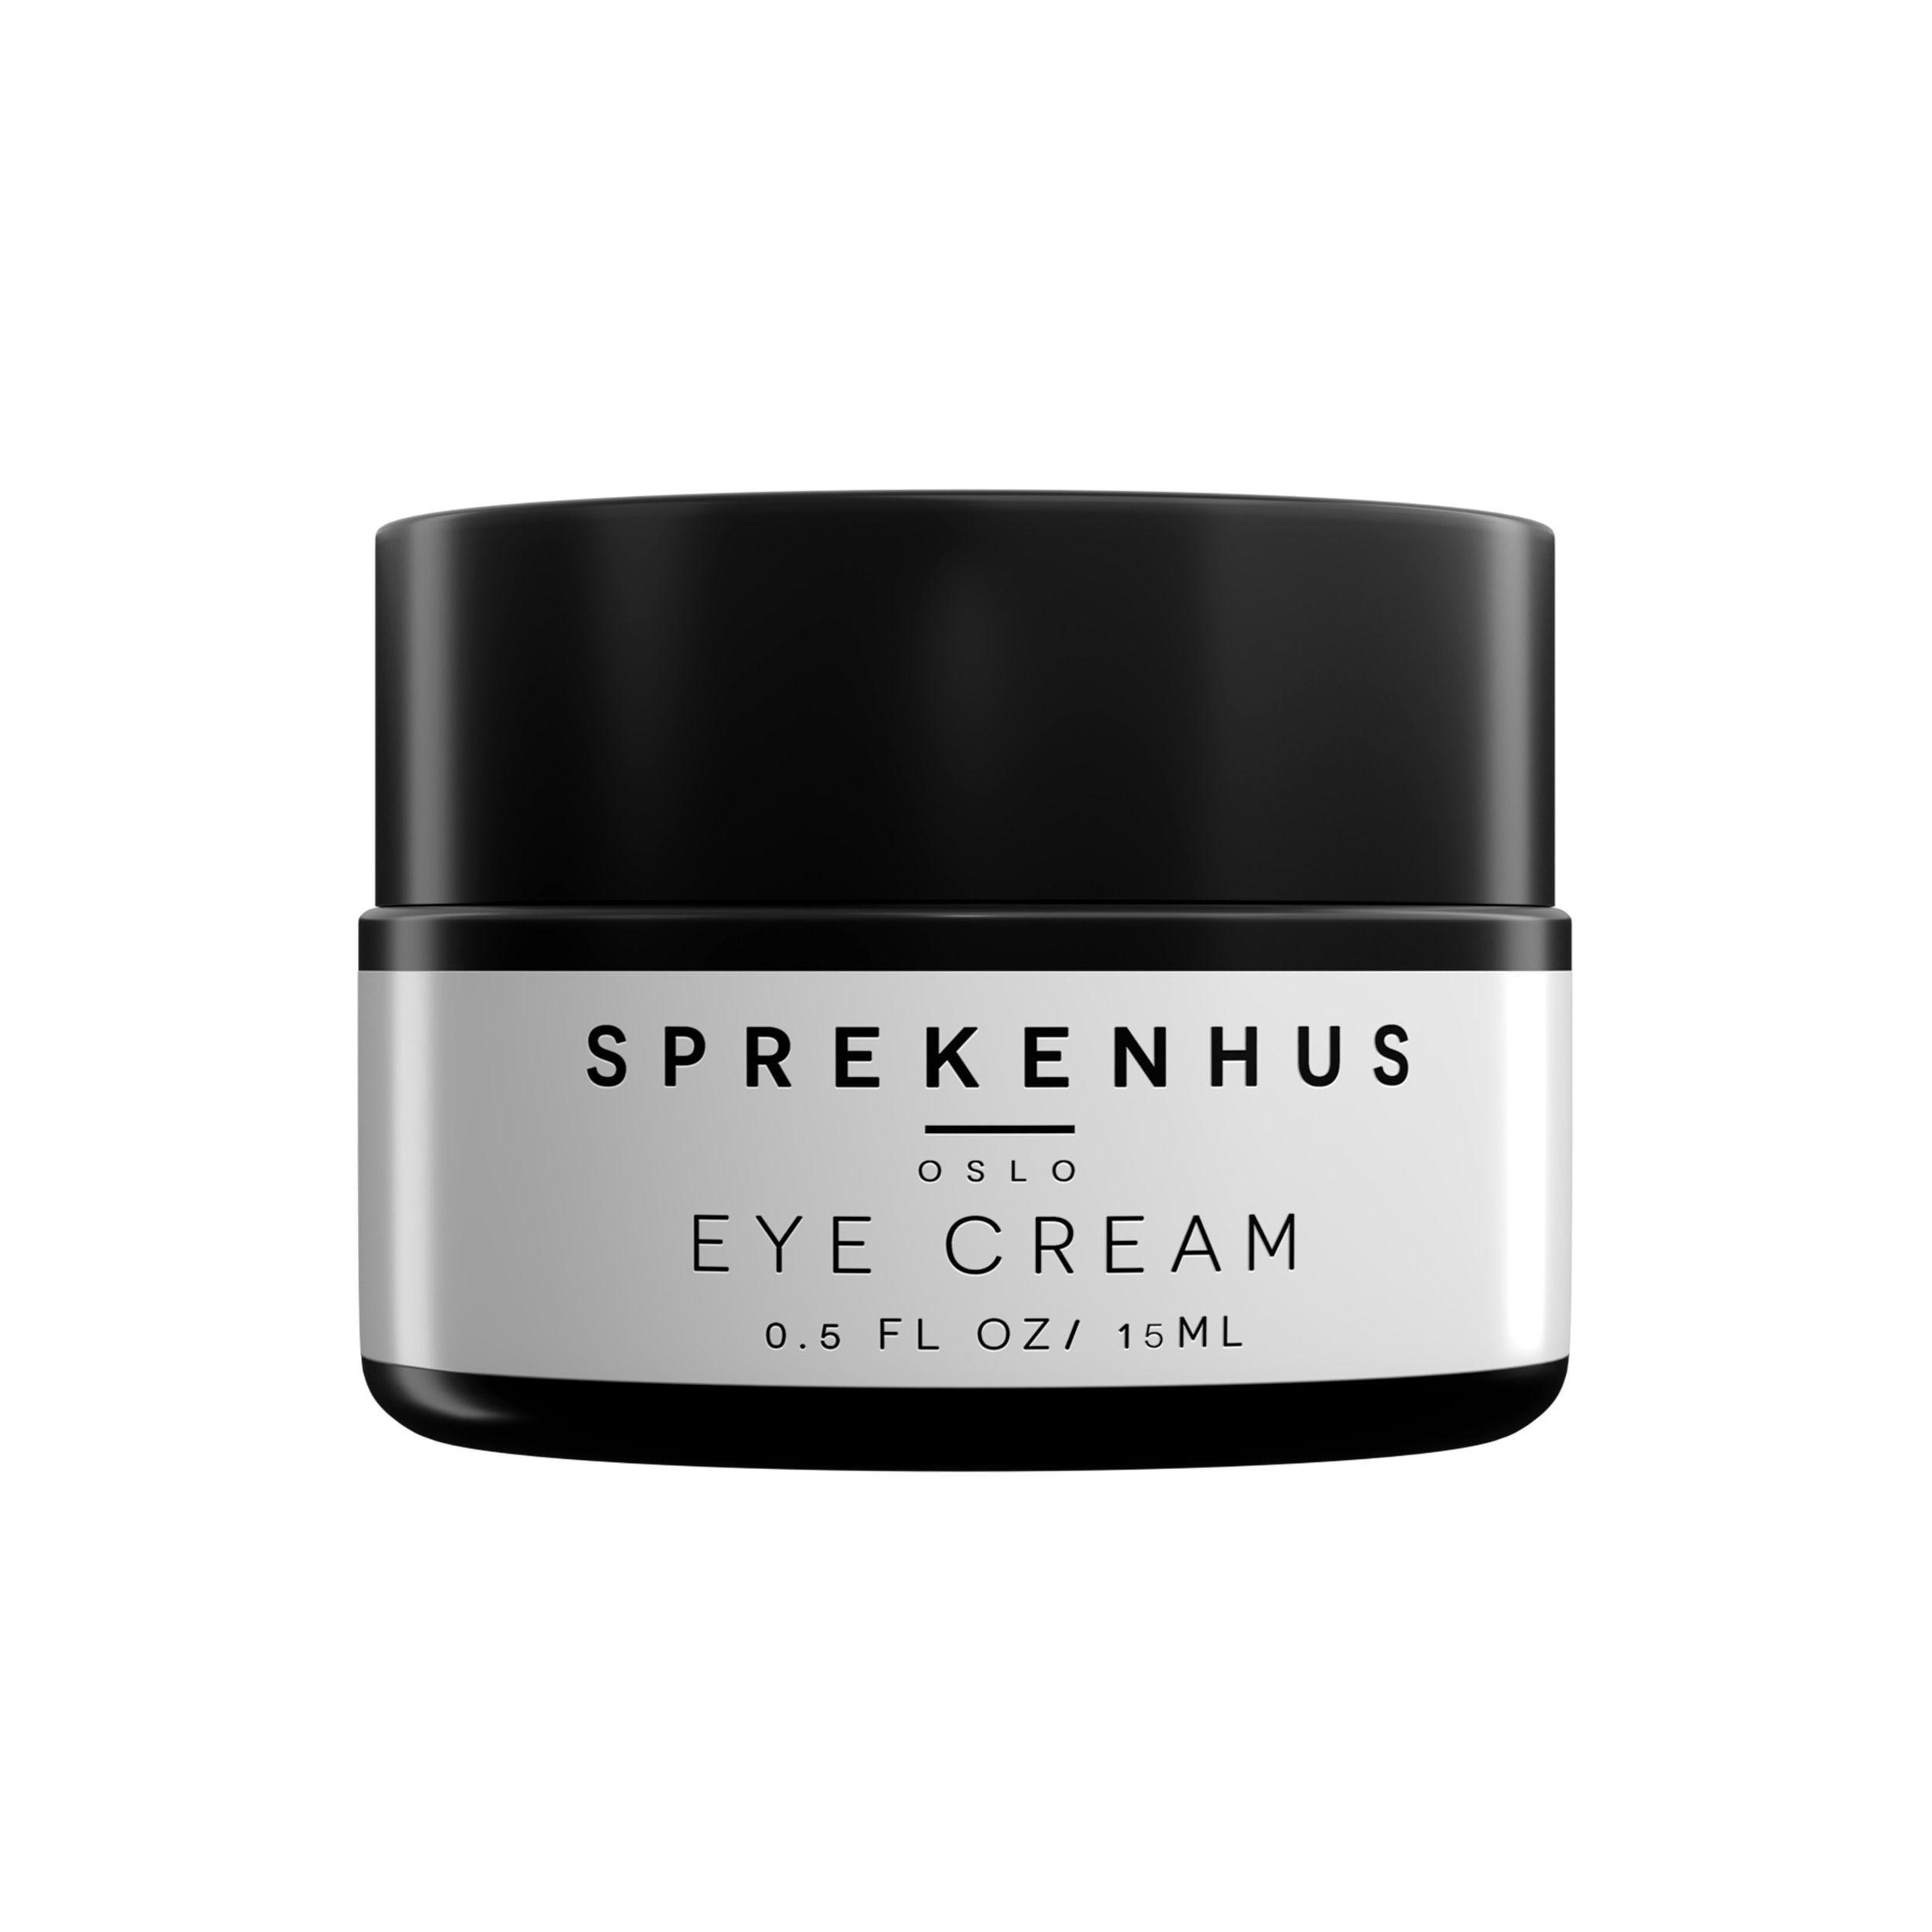 Sprekenhus Eye Cream